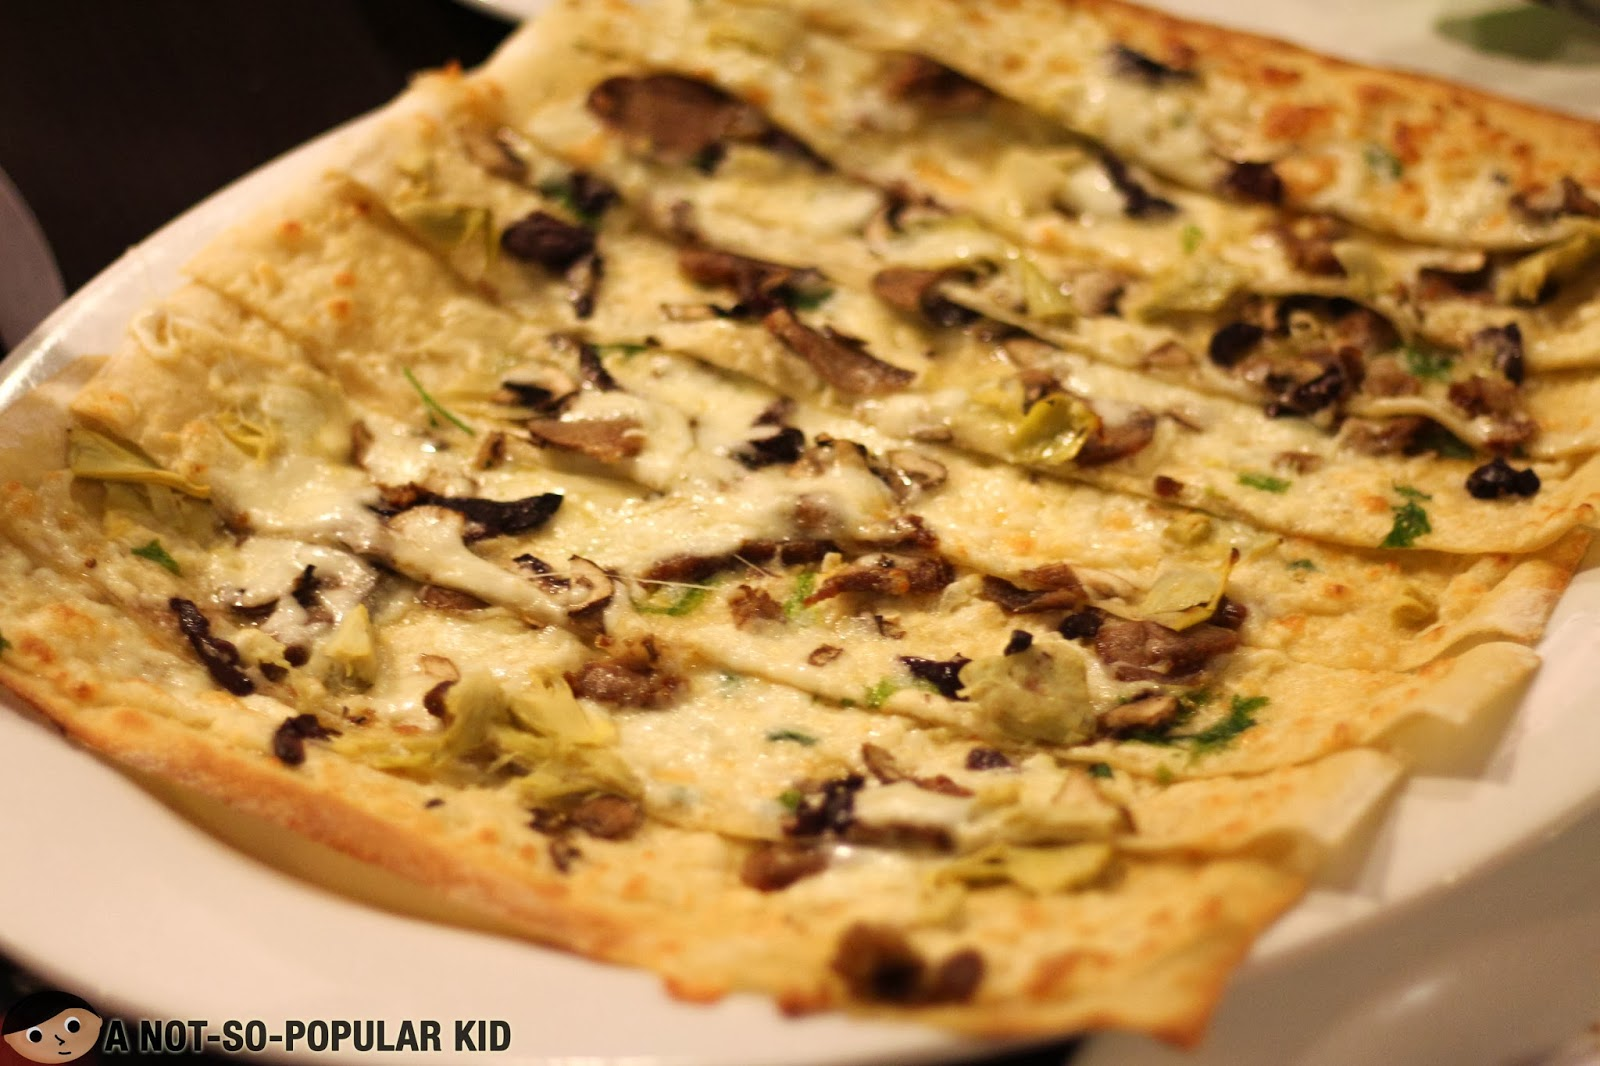 Exquisite and unique - Original Aura pizza by Chef Chris!